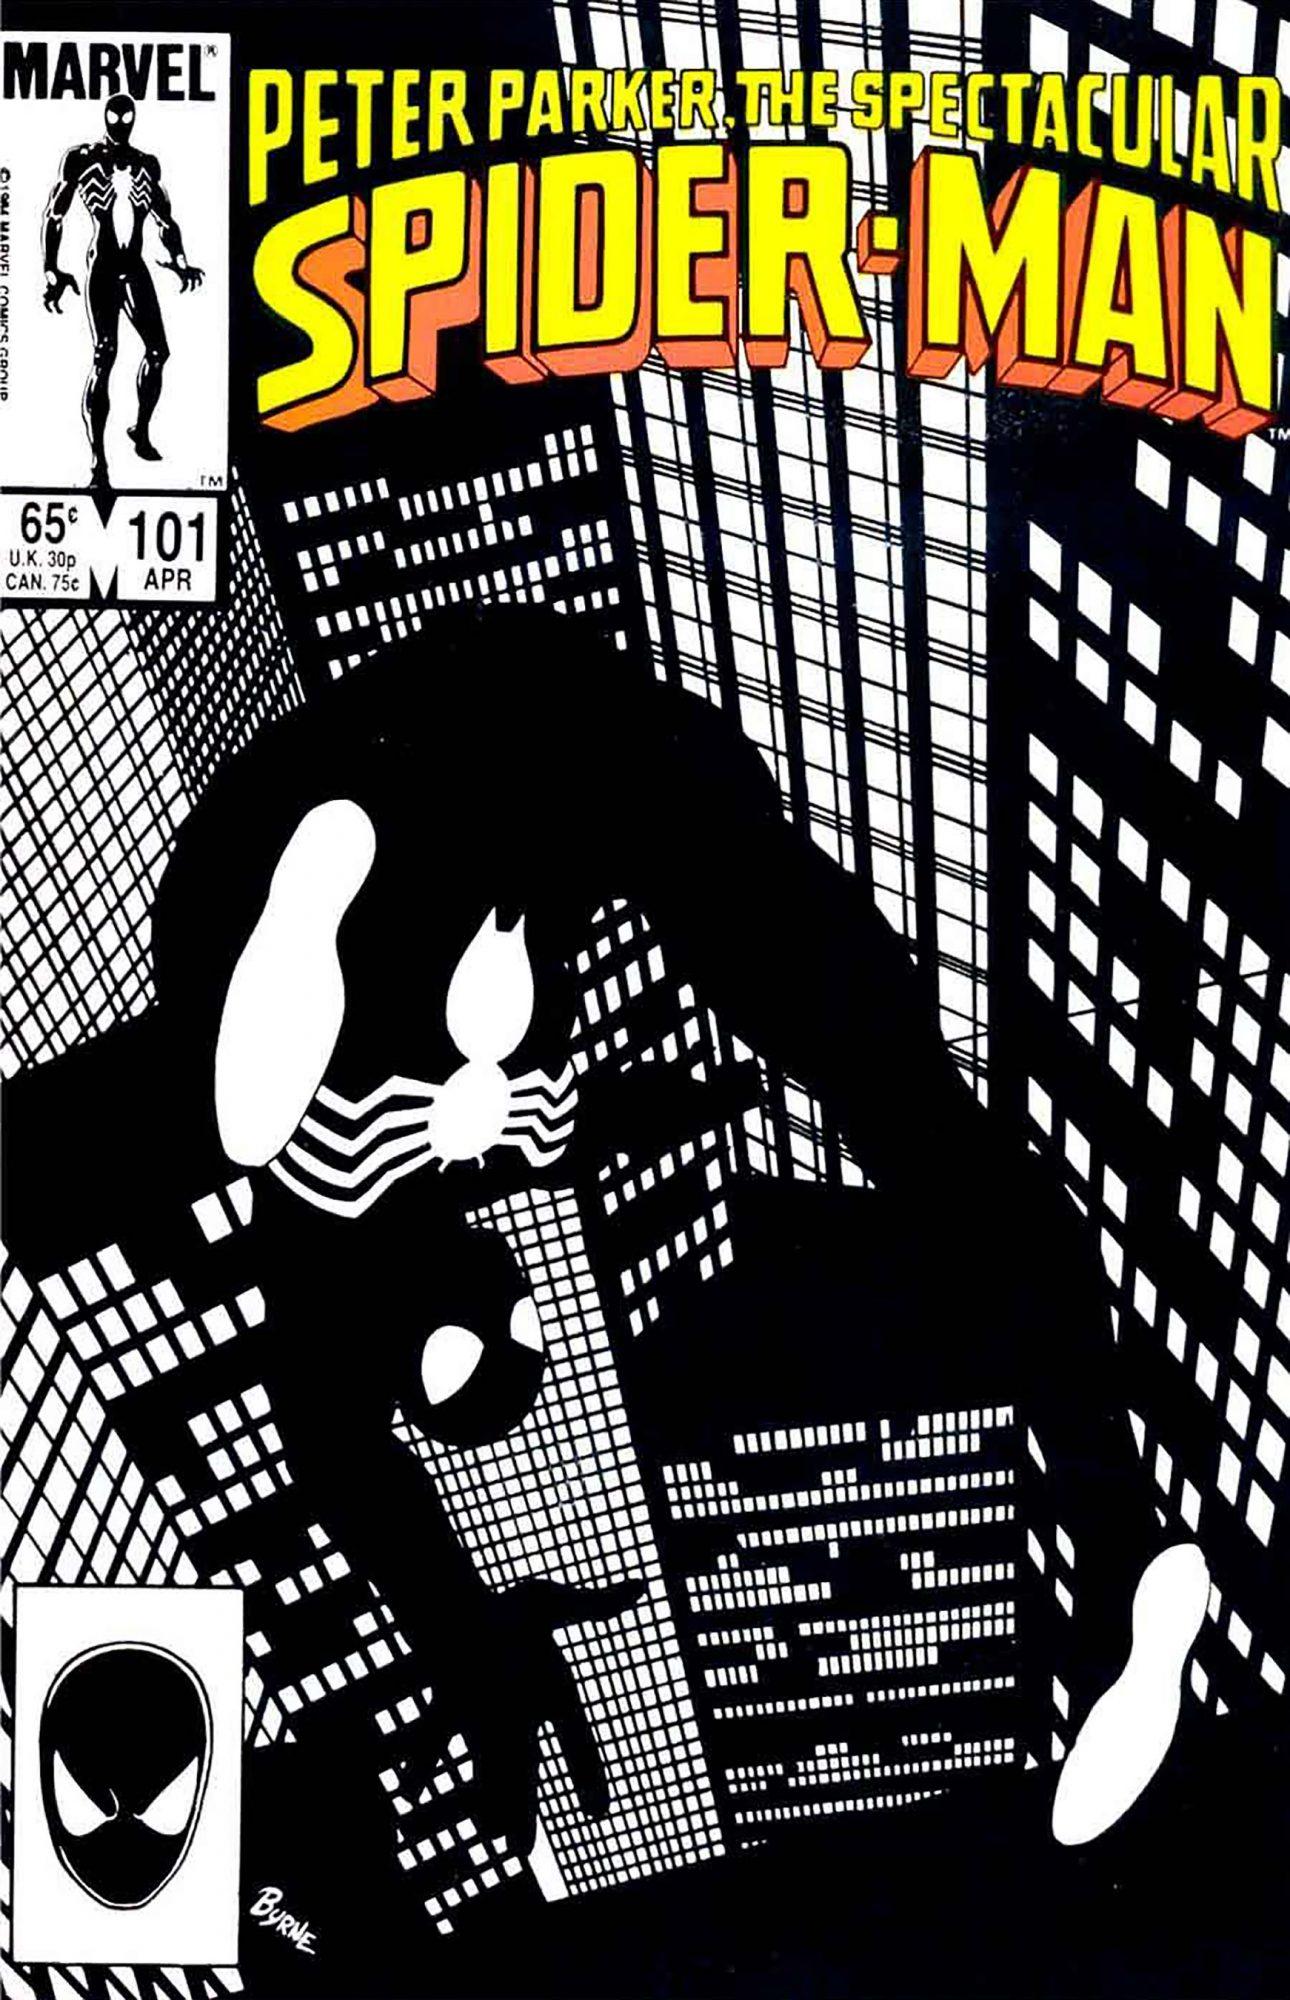 Spectacular Spider-Man #101John Byrne, 1985